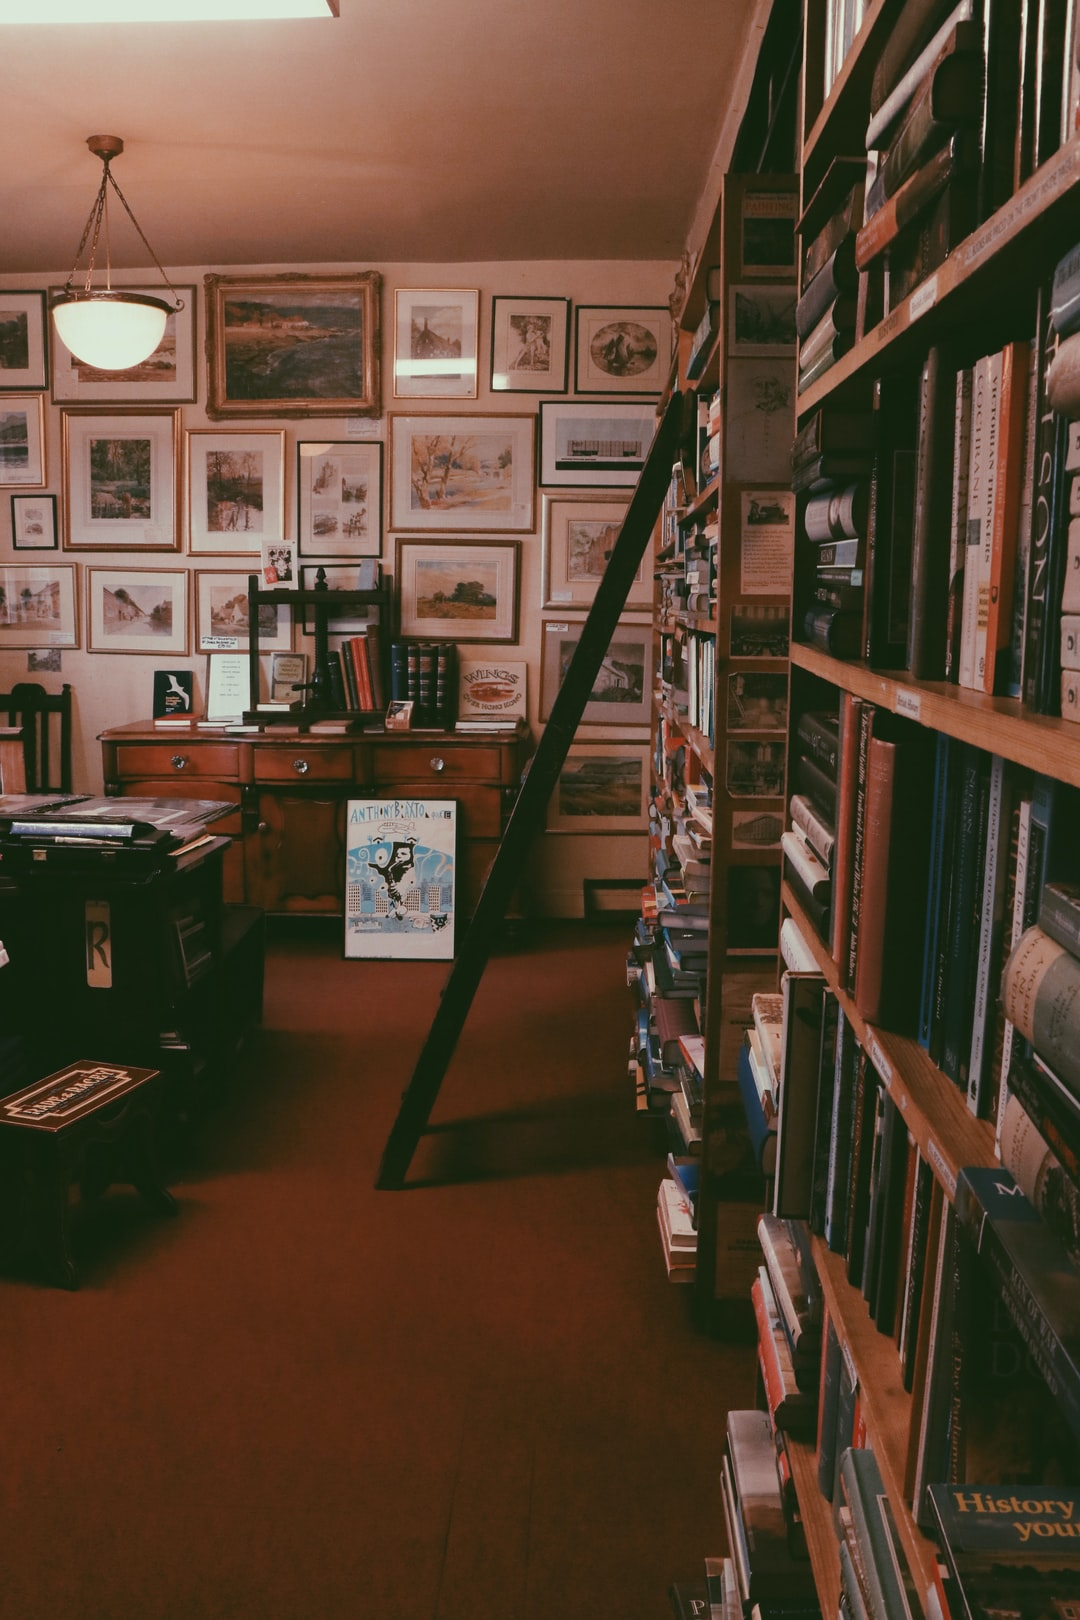 Rare & Racy Local History Library